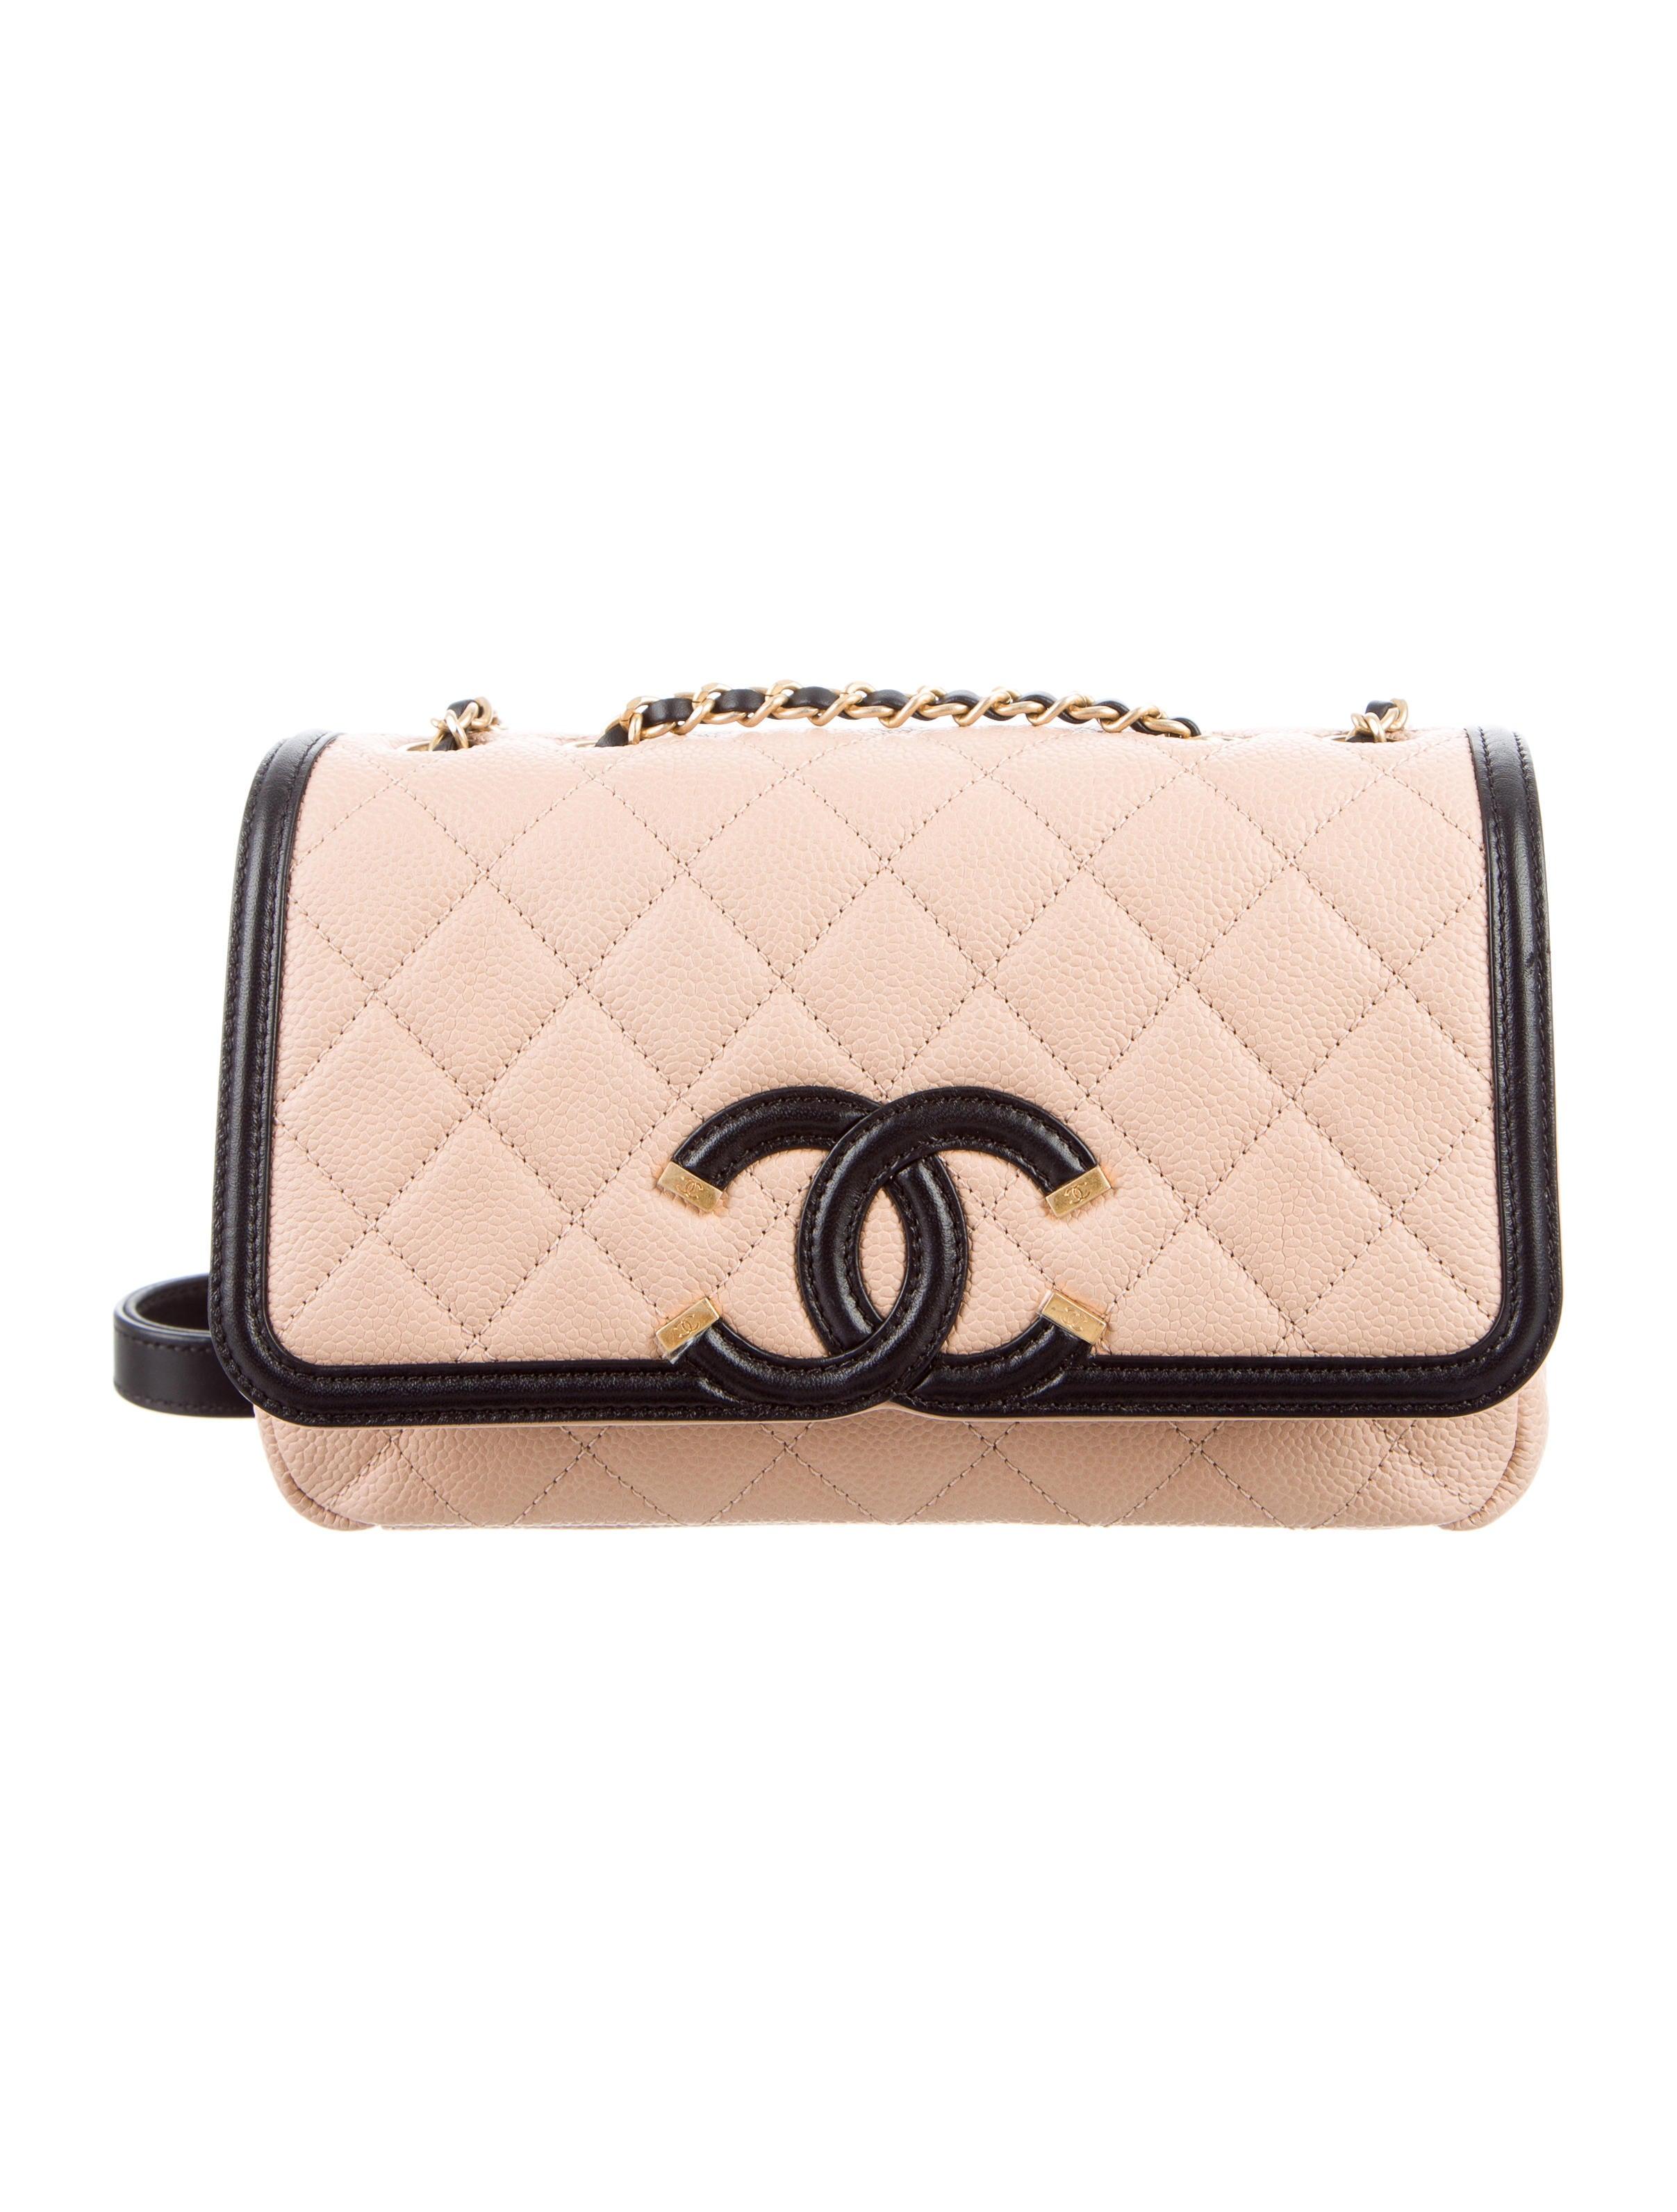 a5a4518abff0 Chanel 2017 CC Filigree Small Flap Bag w/ Tags - Handbags ...